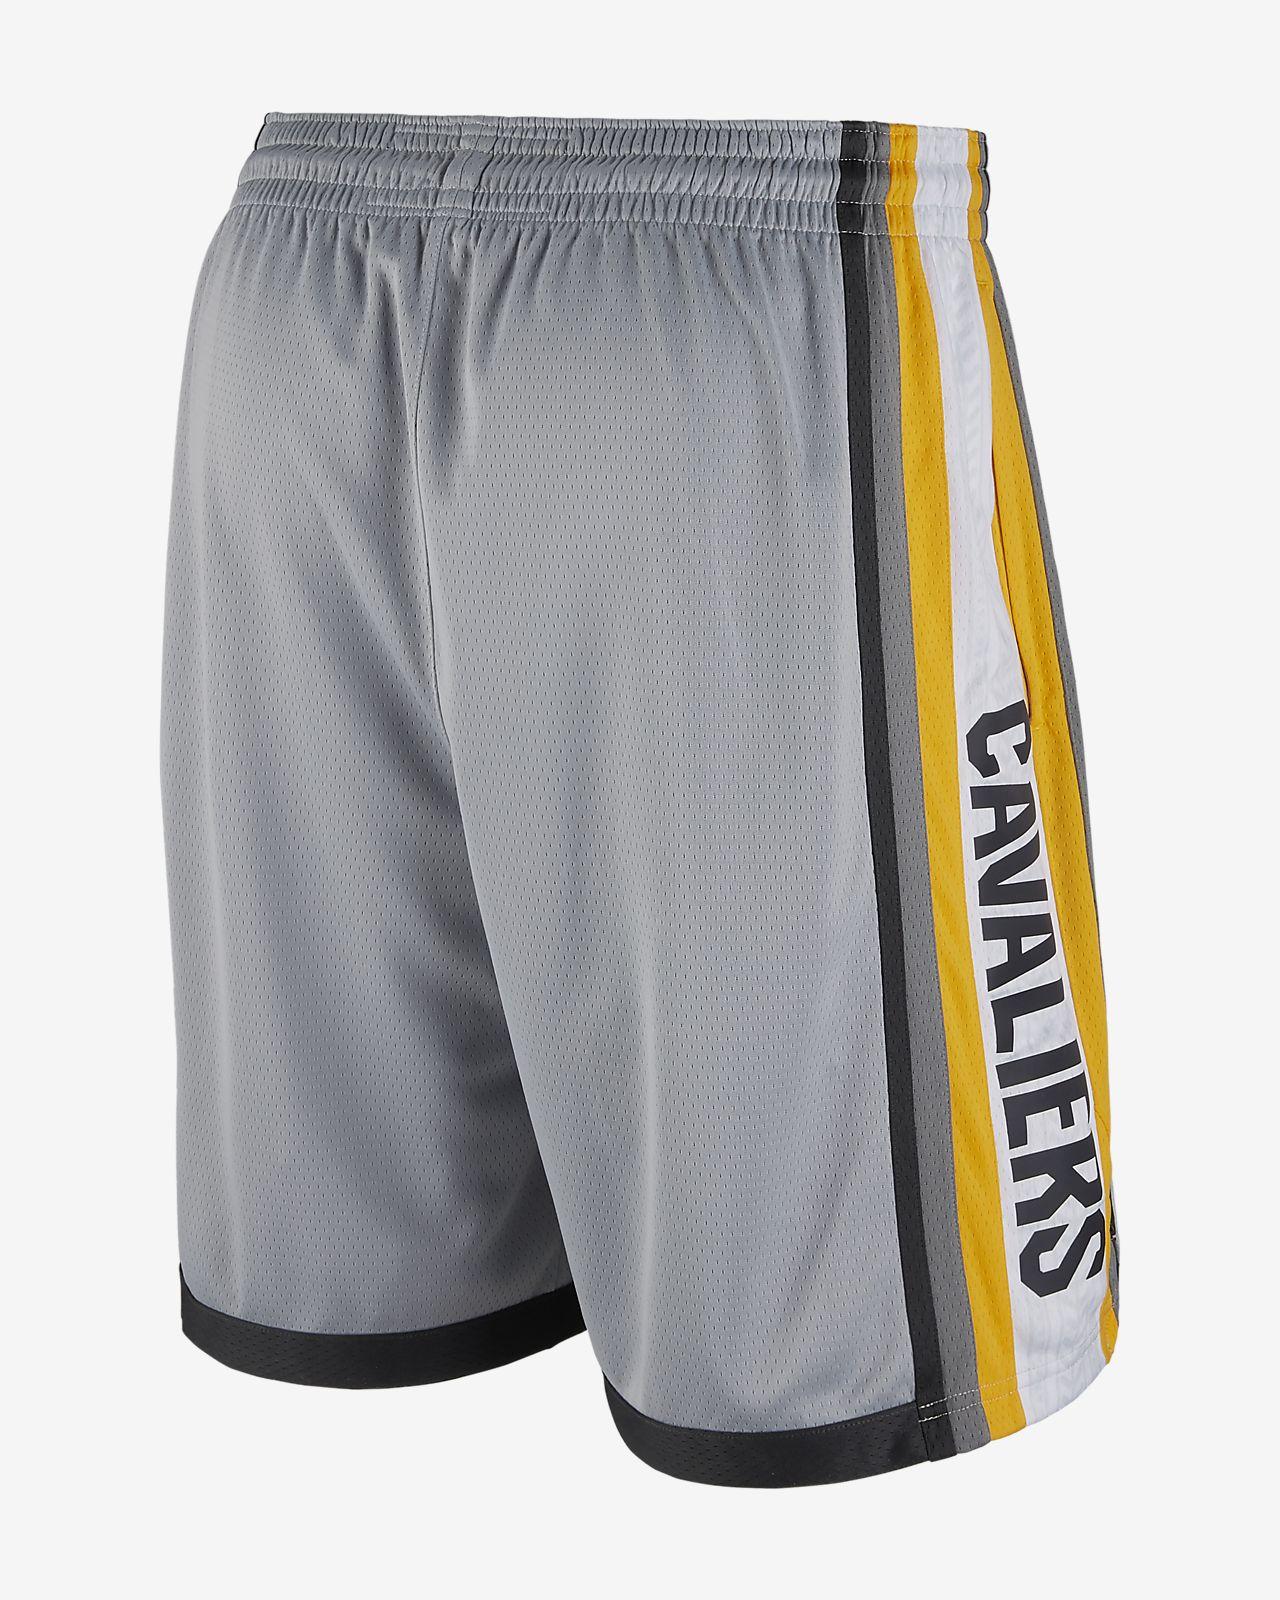 511971ed9 ... Shorts de NBA para hombre Cleveland Cavaliers Nike City Edition Swingman